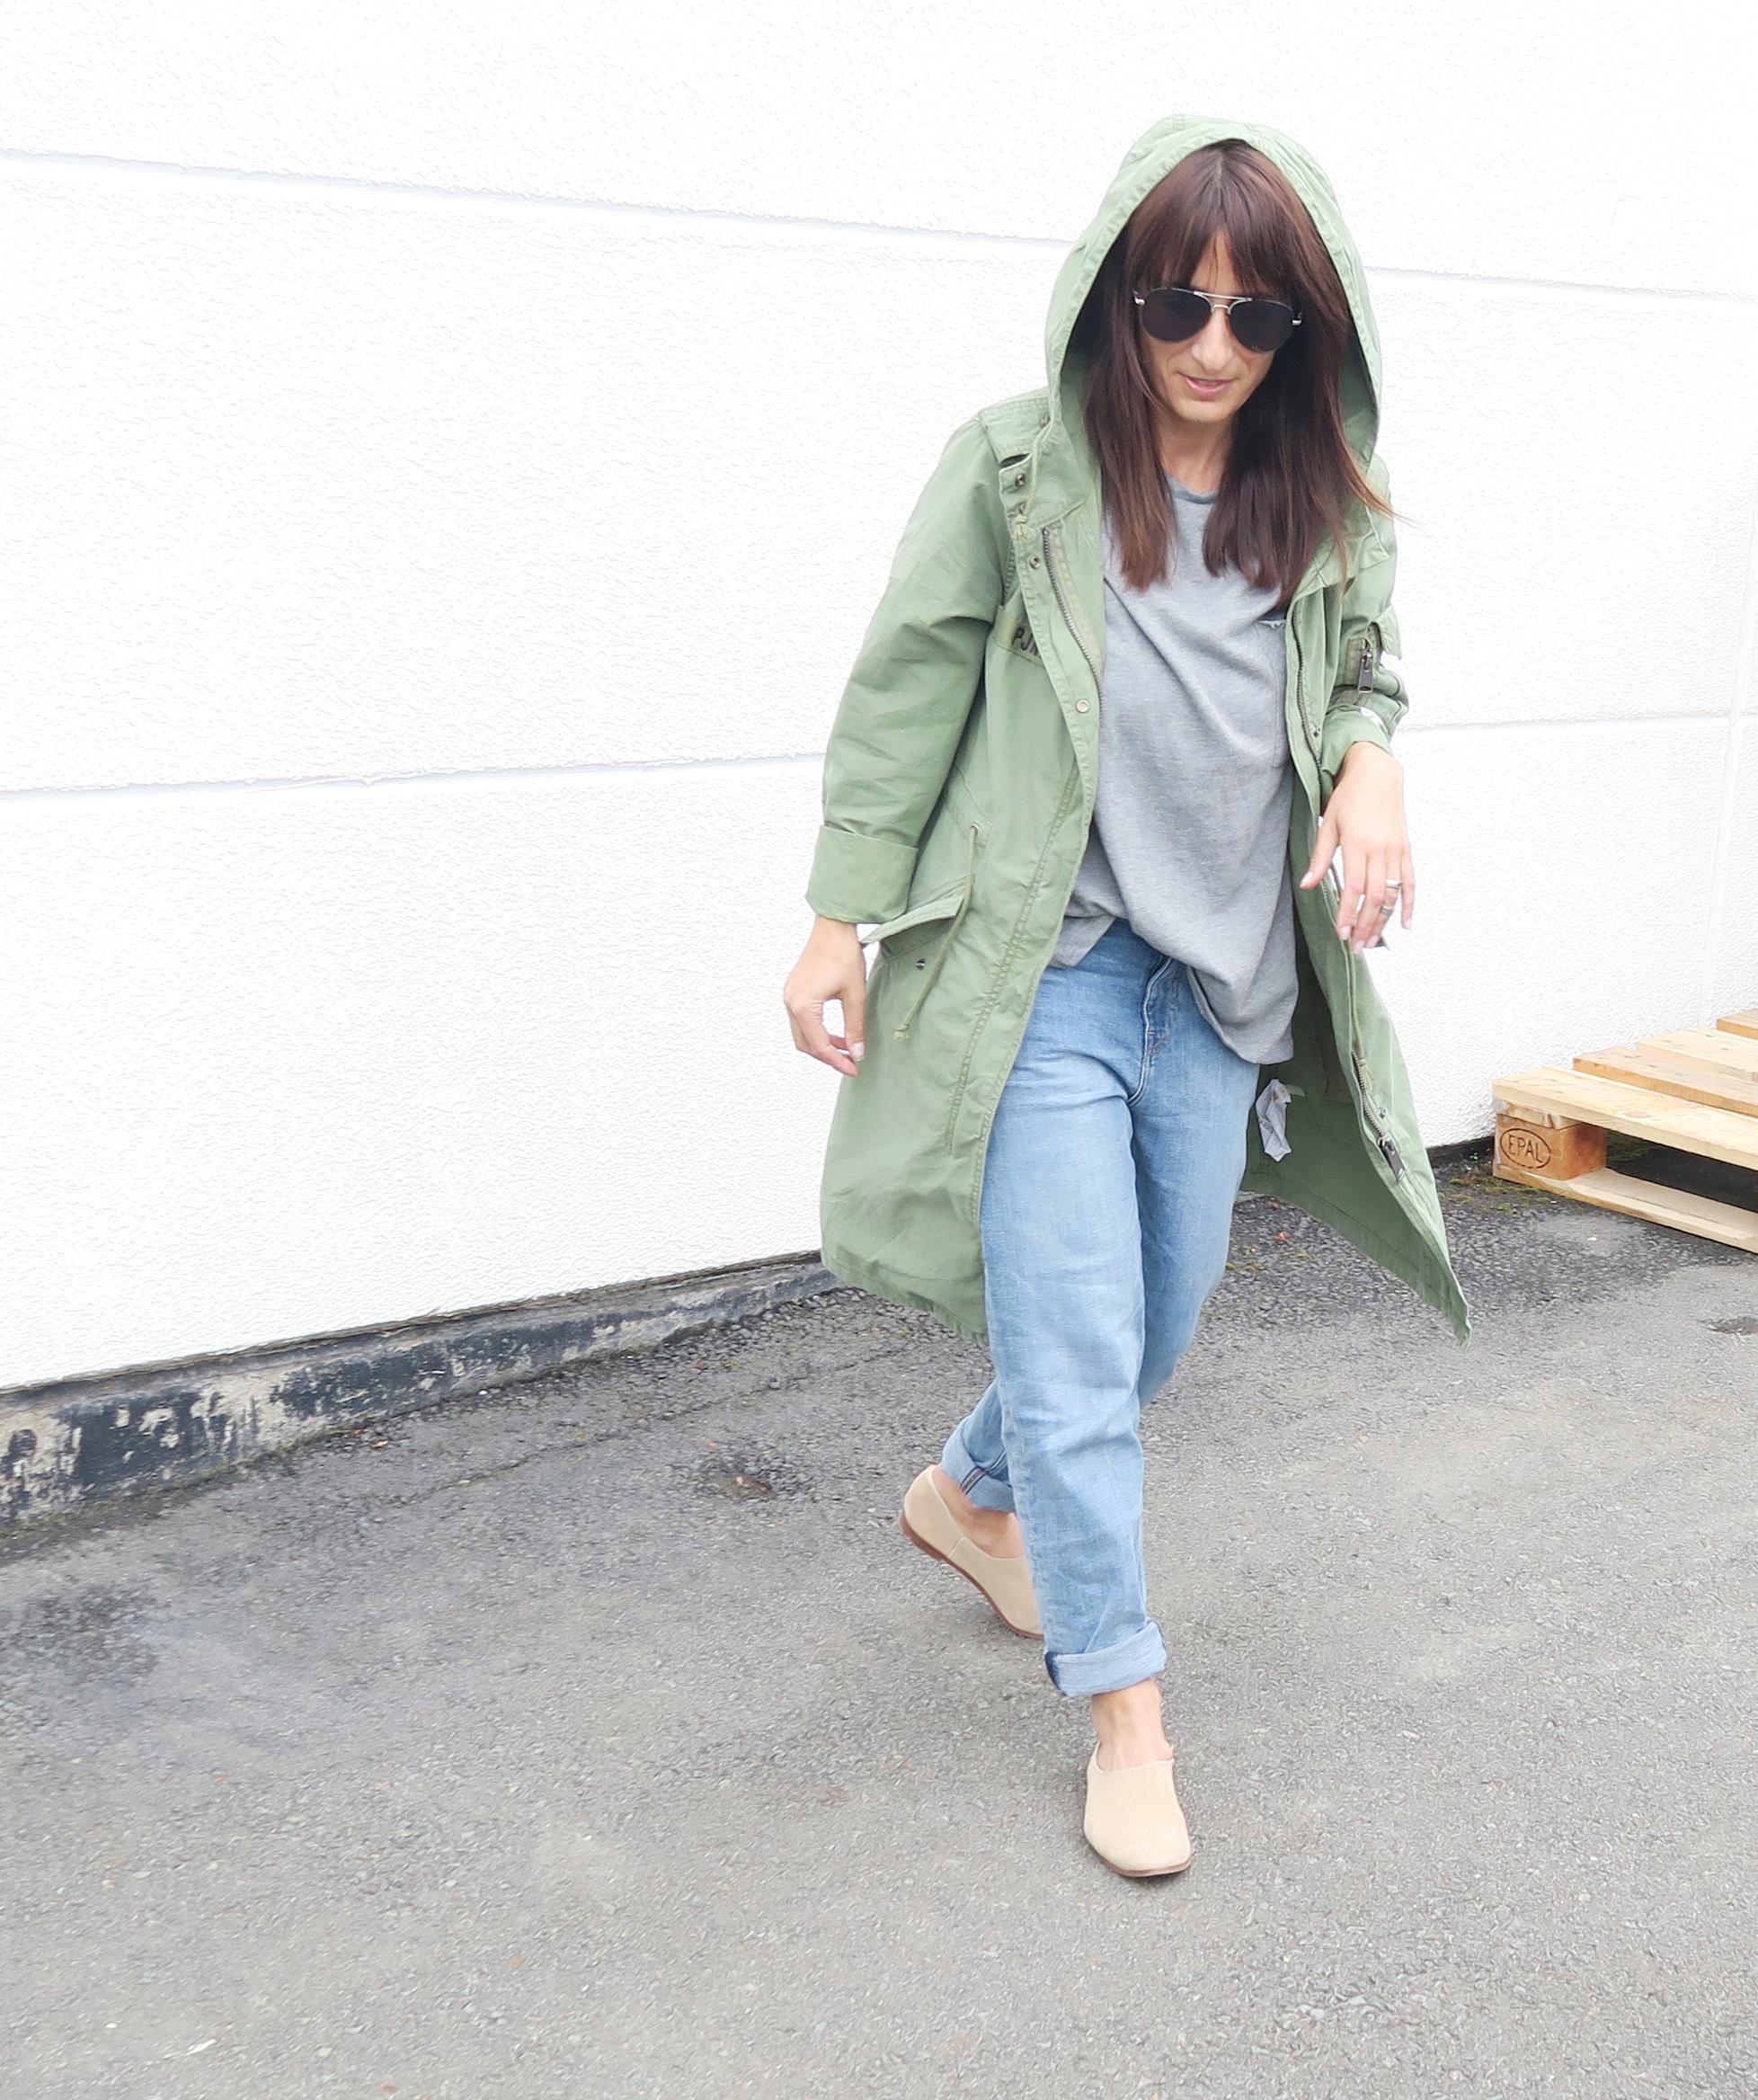 Parka-Streetstyle-Blogger-Modesalat-Fashion-style-look-zara-1